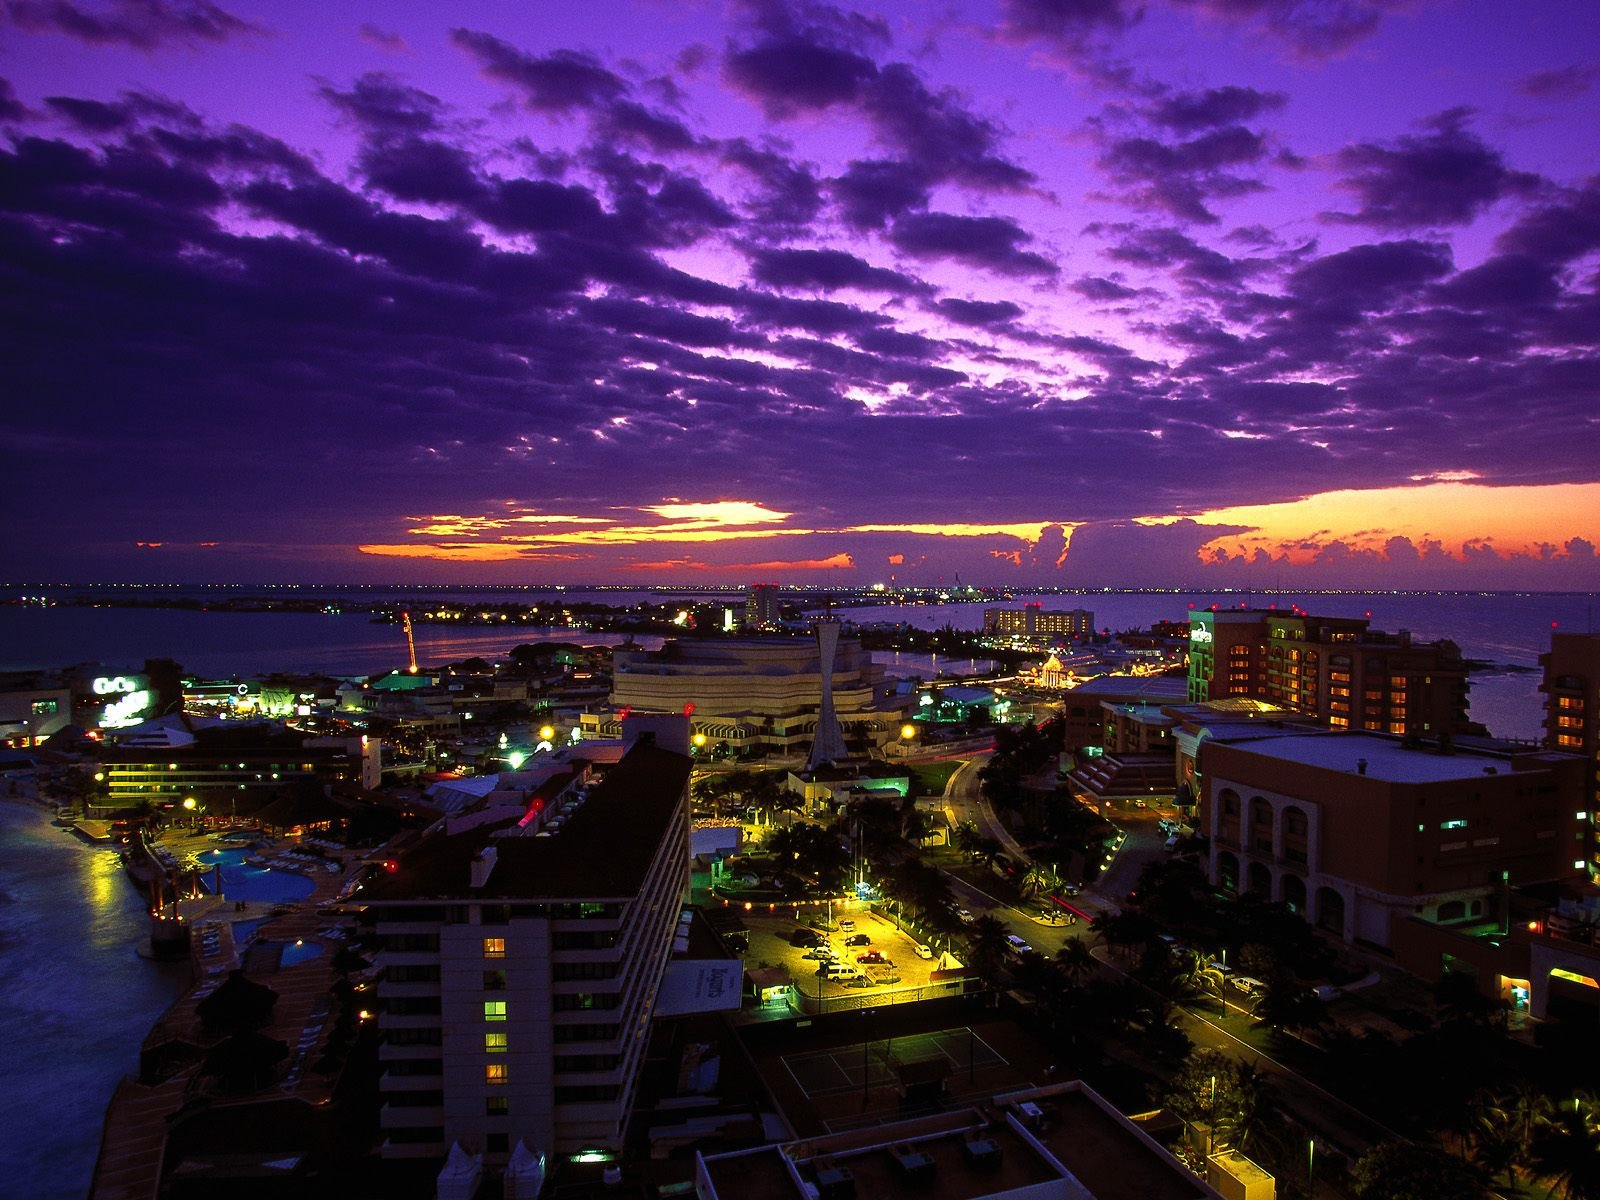 огни город море сумерки lights the city sea twilight бесплатно